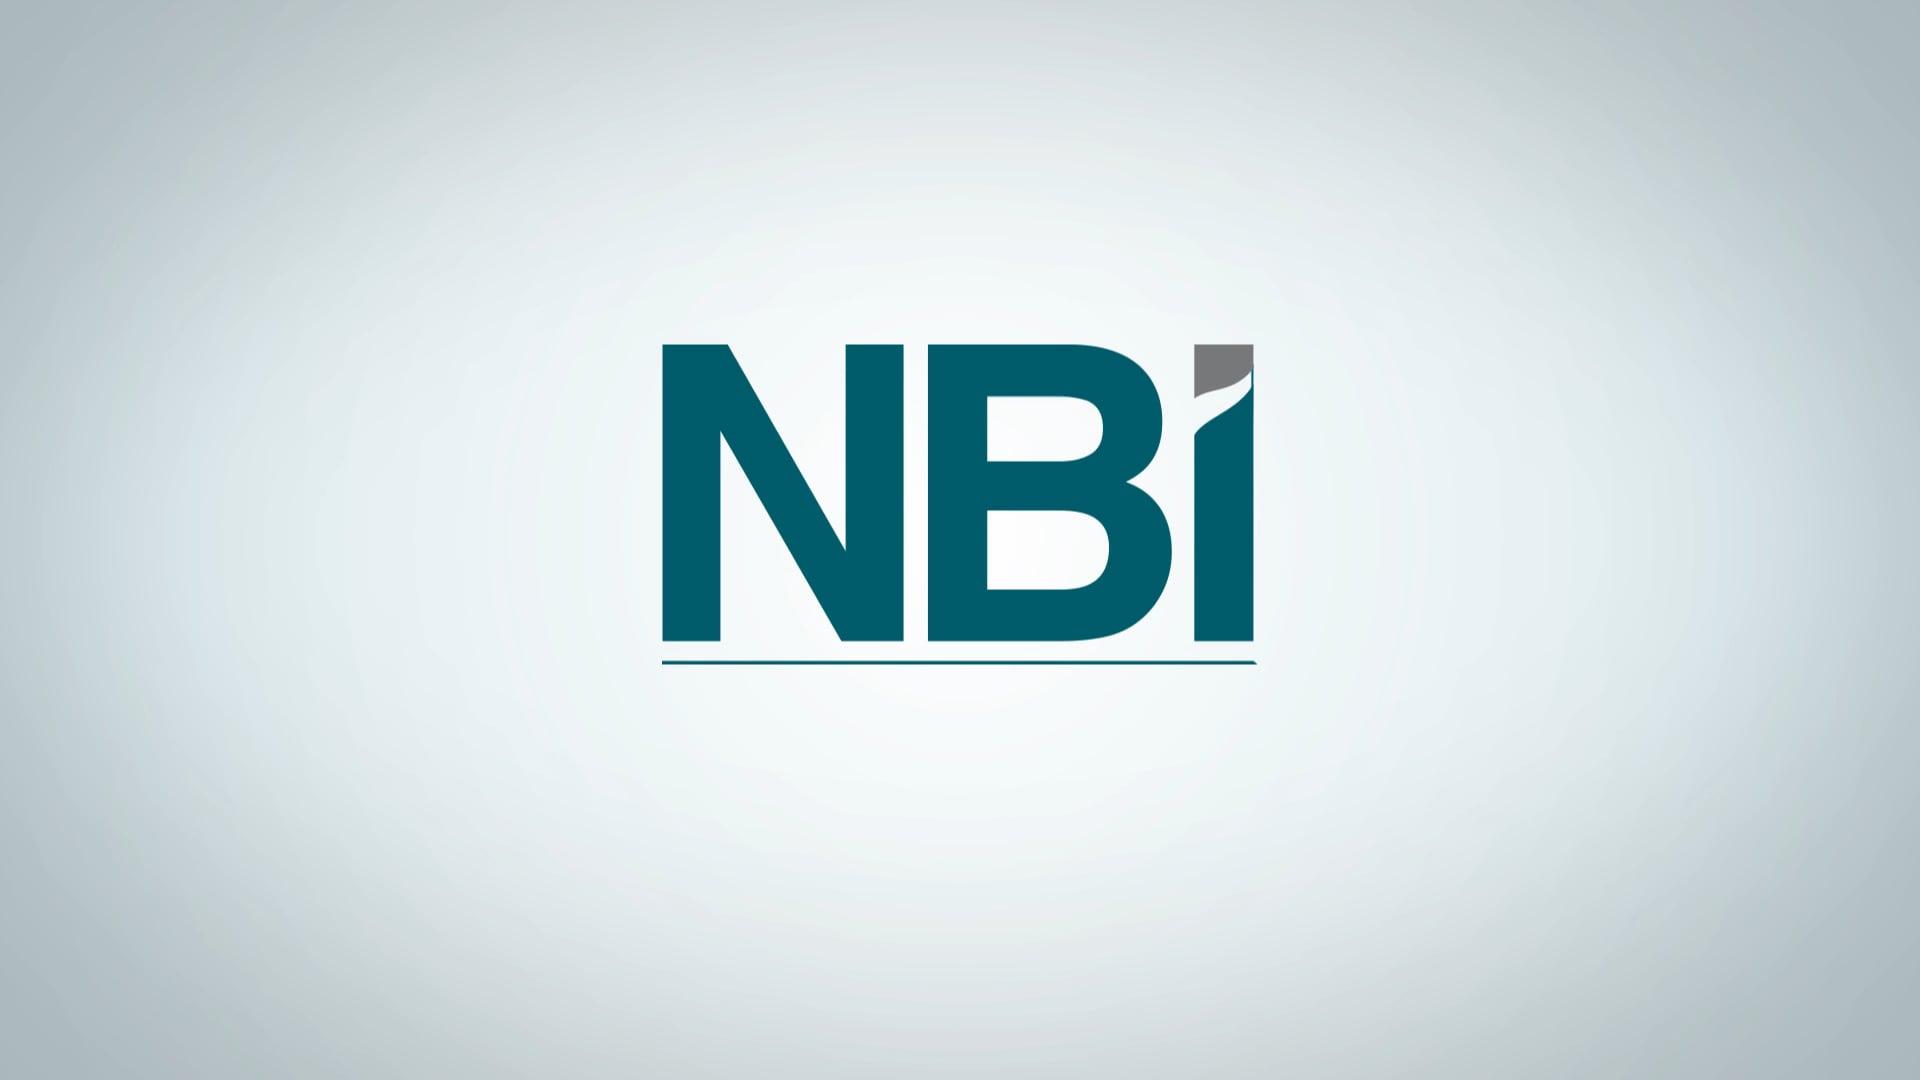 NBI | Sustainable Development